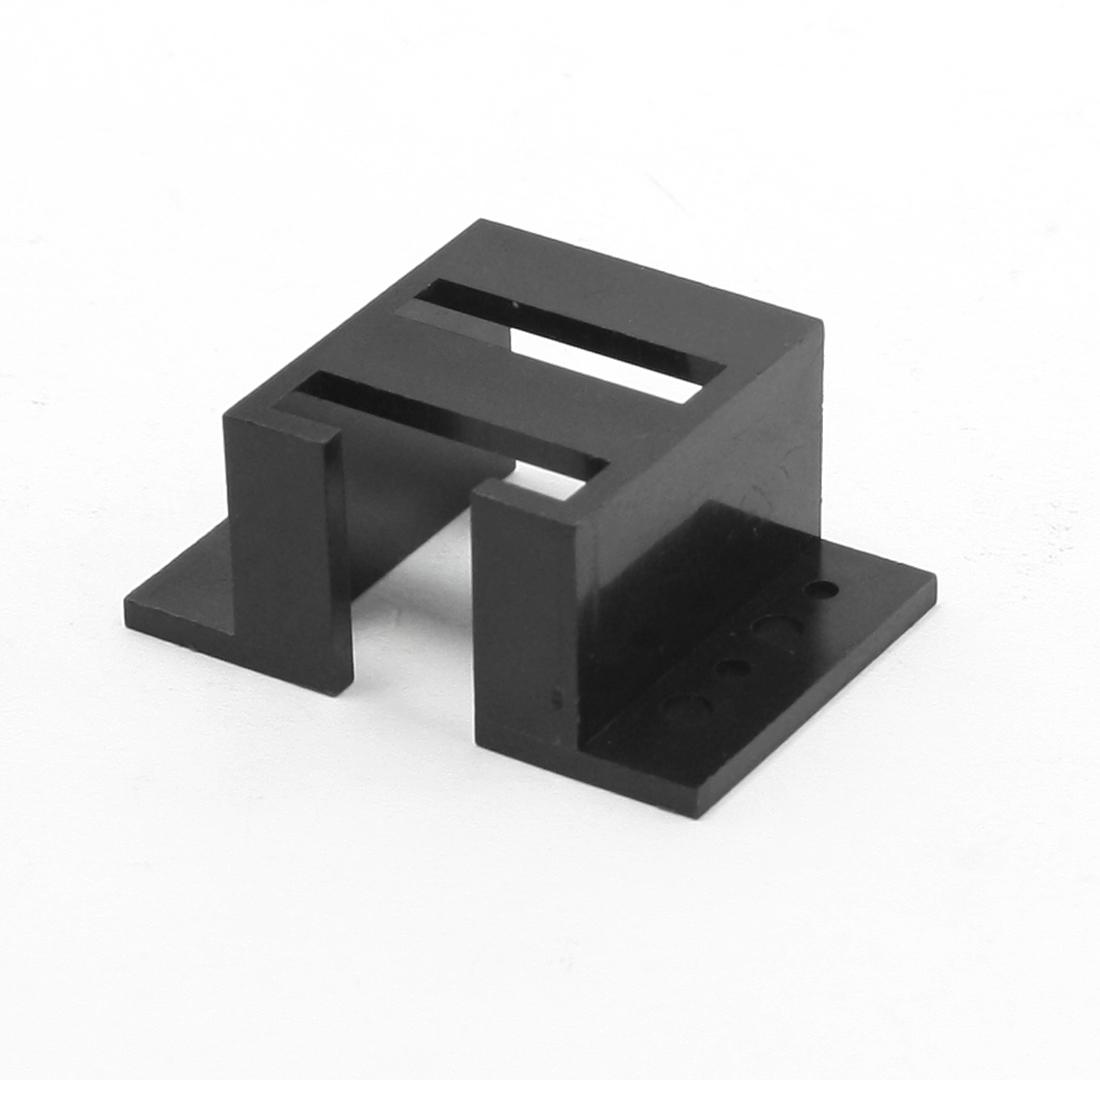 Black Plastic Mount Hole Dia 2.5mm 1.5mm Robot Model Bracket